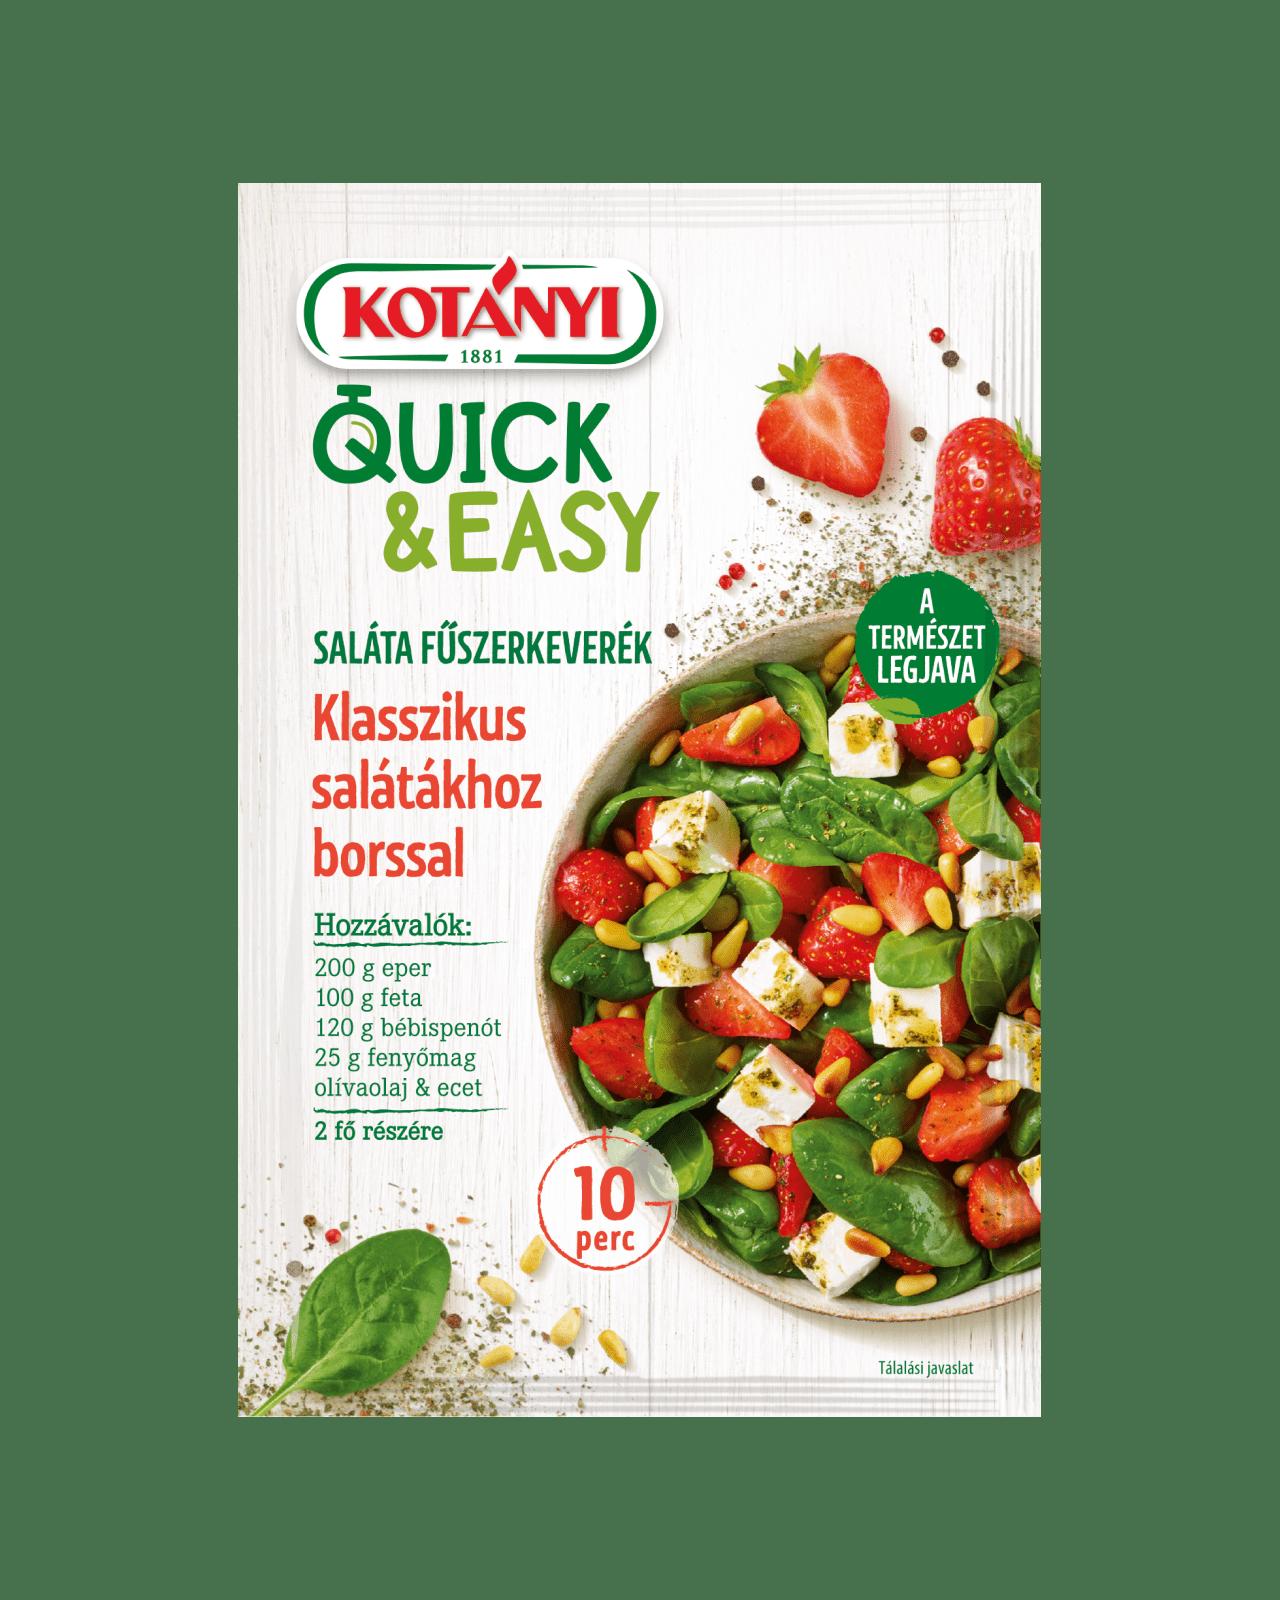 3706025 Quick And Easy Erdbeer Spinat Salad Hu 5995863037063 Min